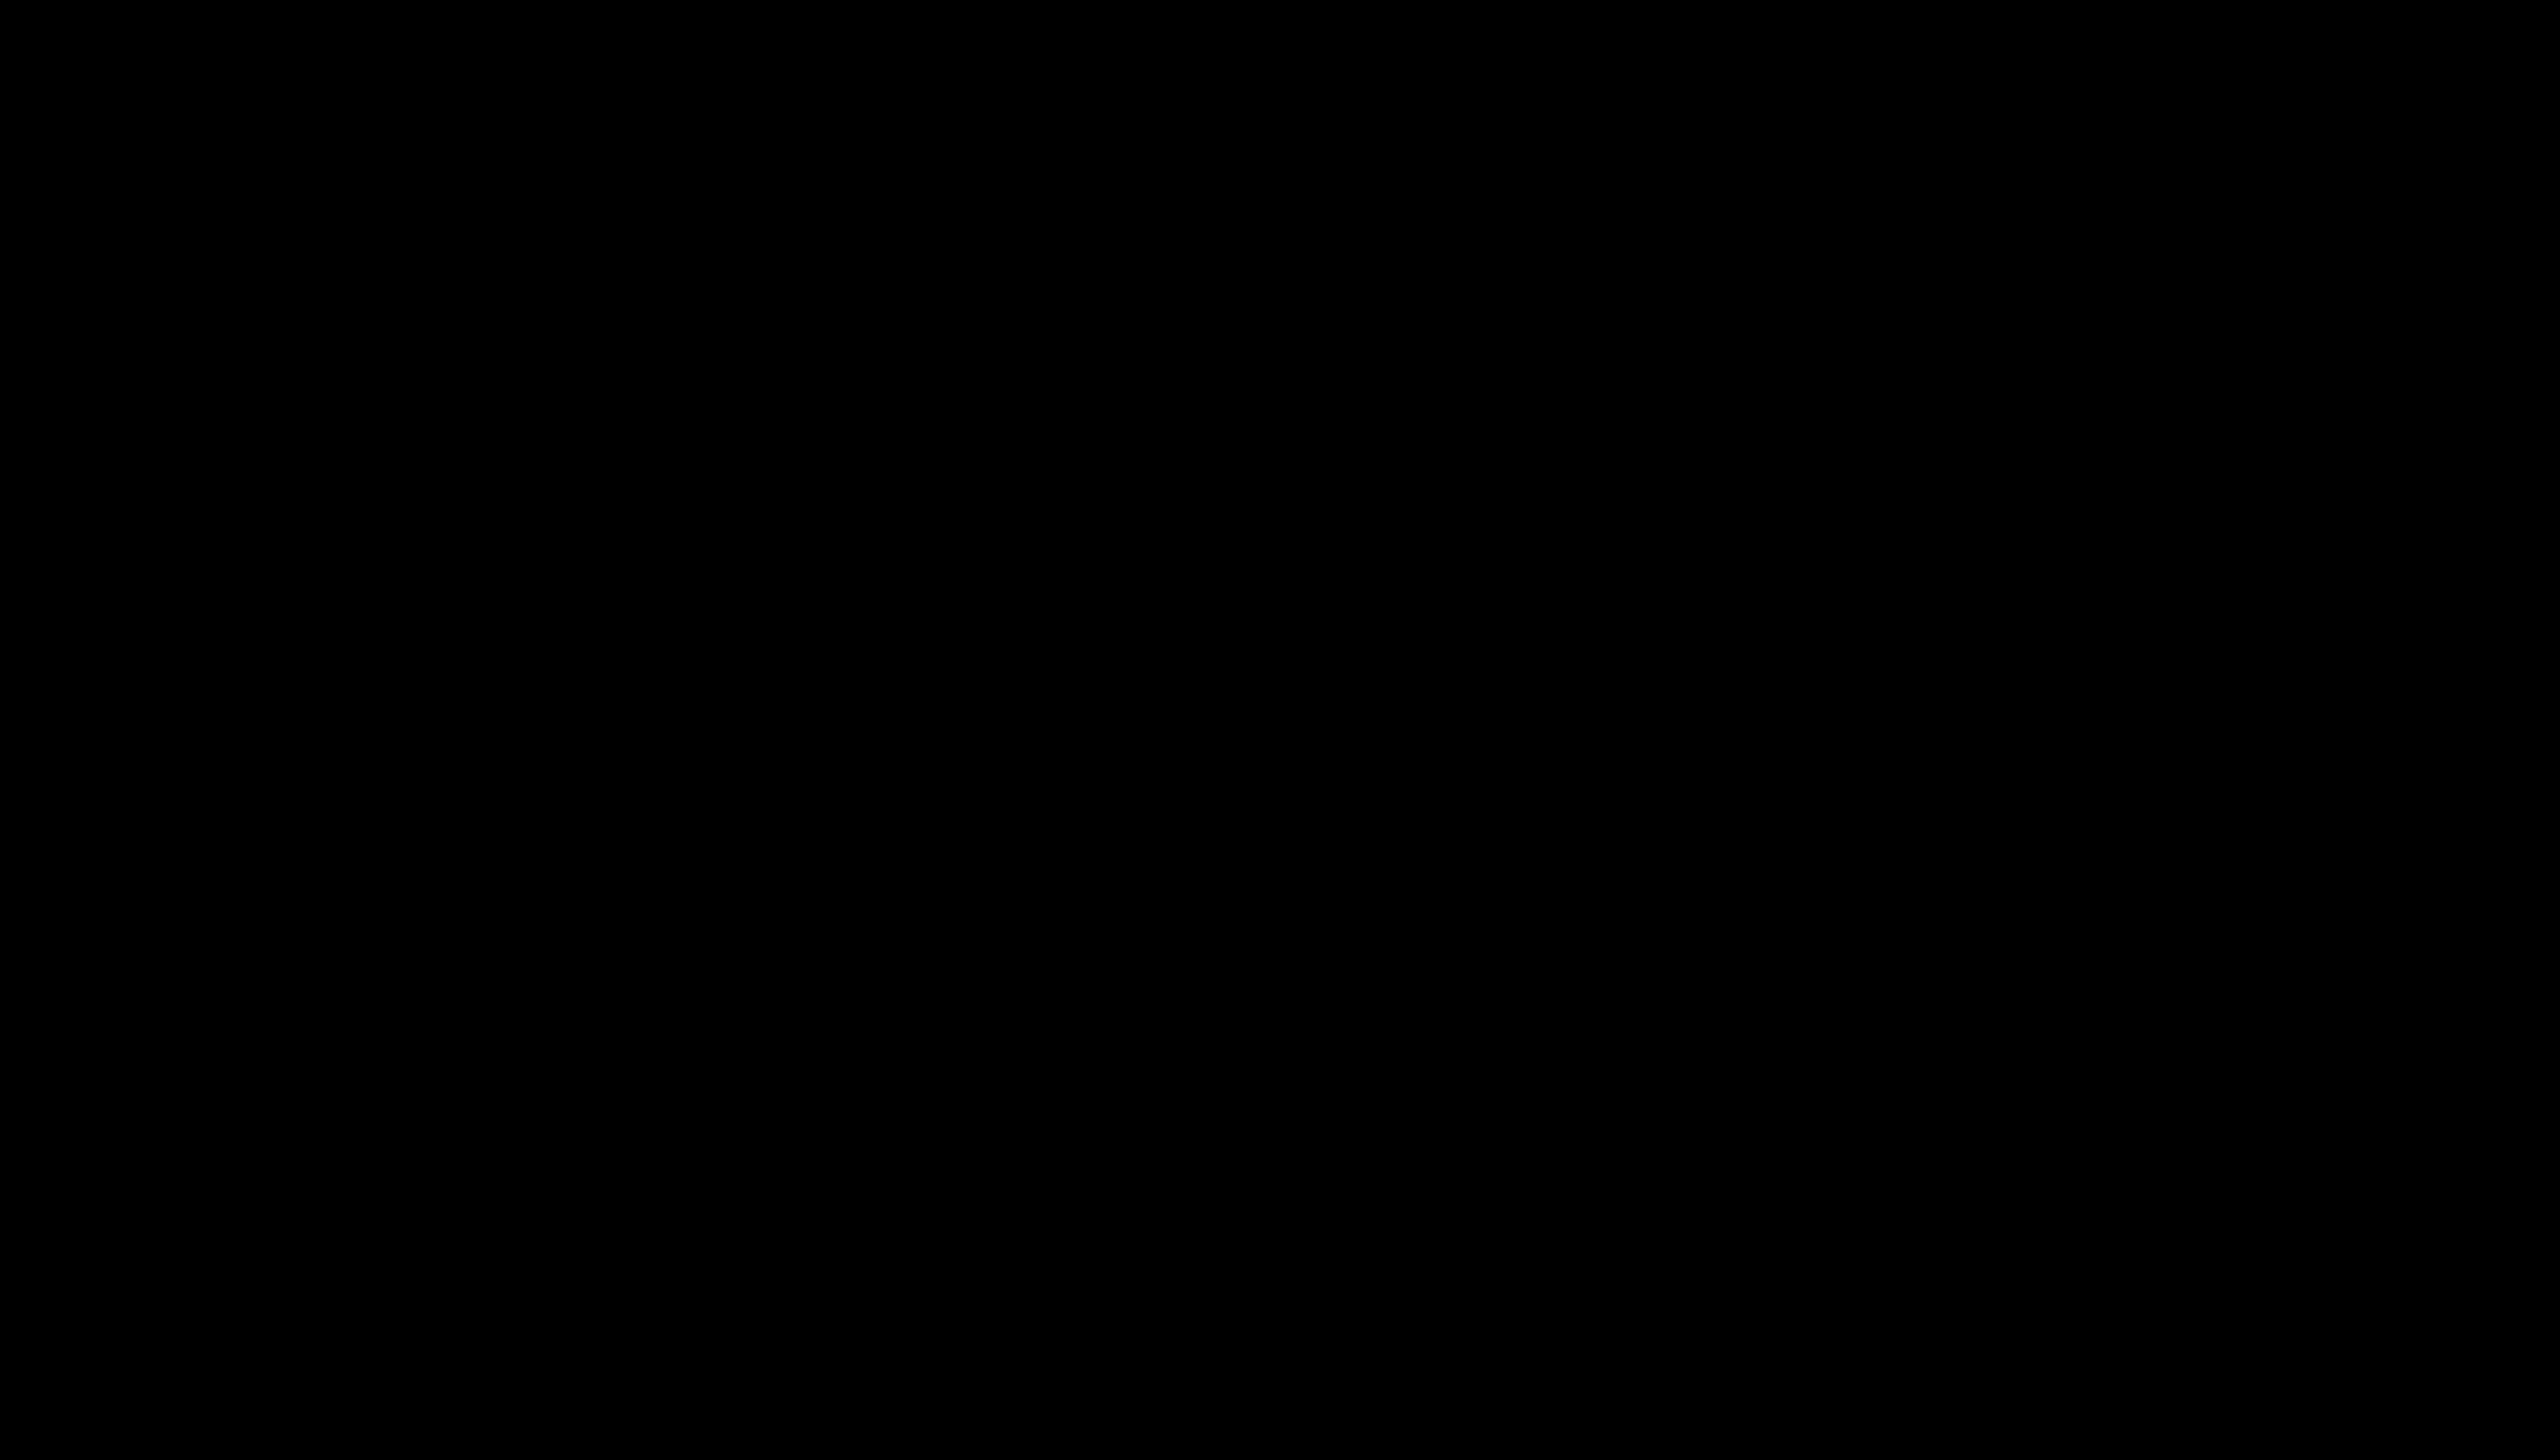 High Resolution-Logitech_RGB_black_LG3500x2400